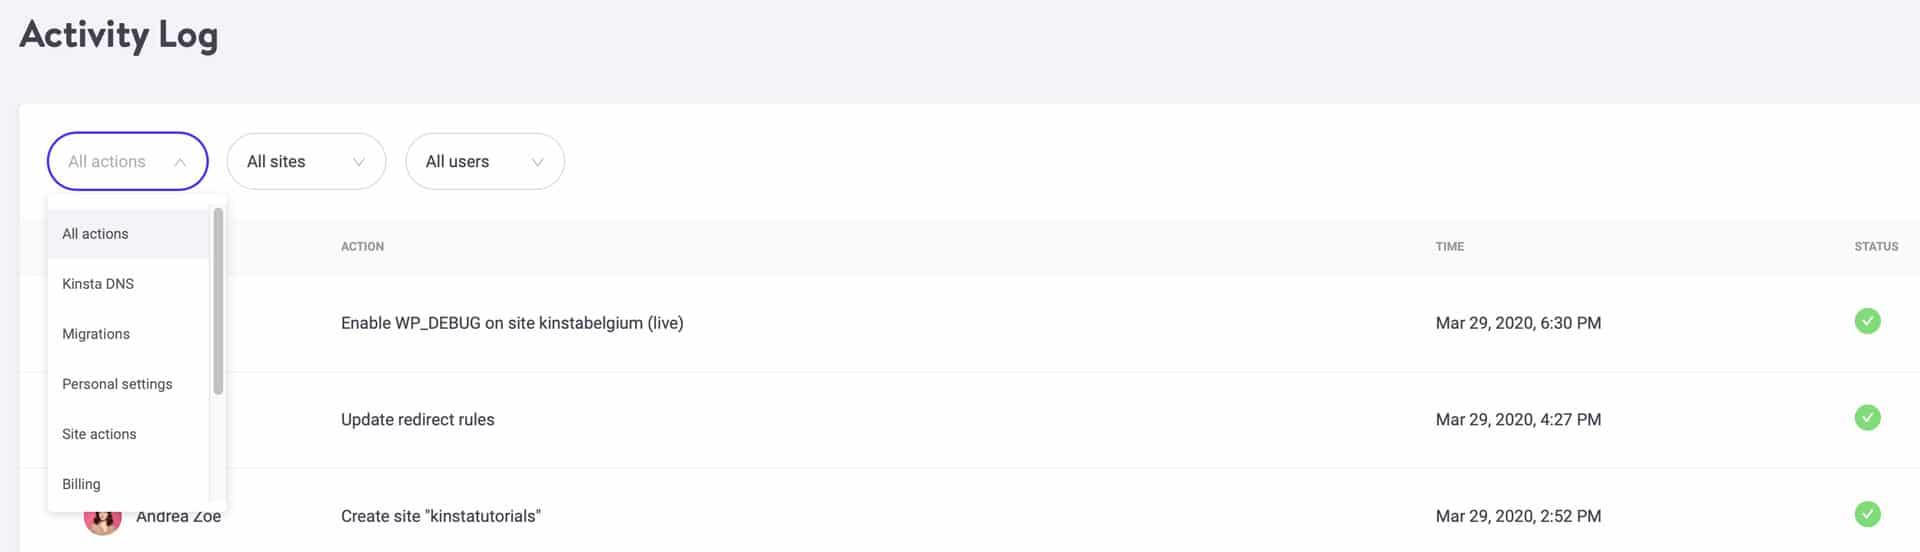 O filtro de categoria para o registo de actividades MyKinsta.